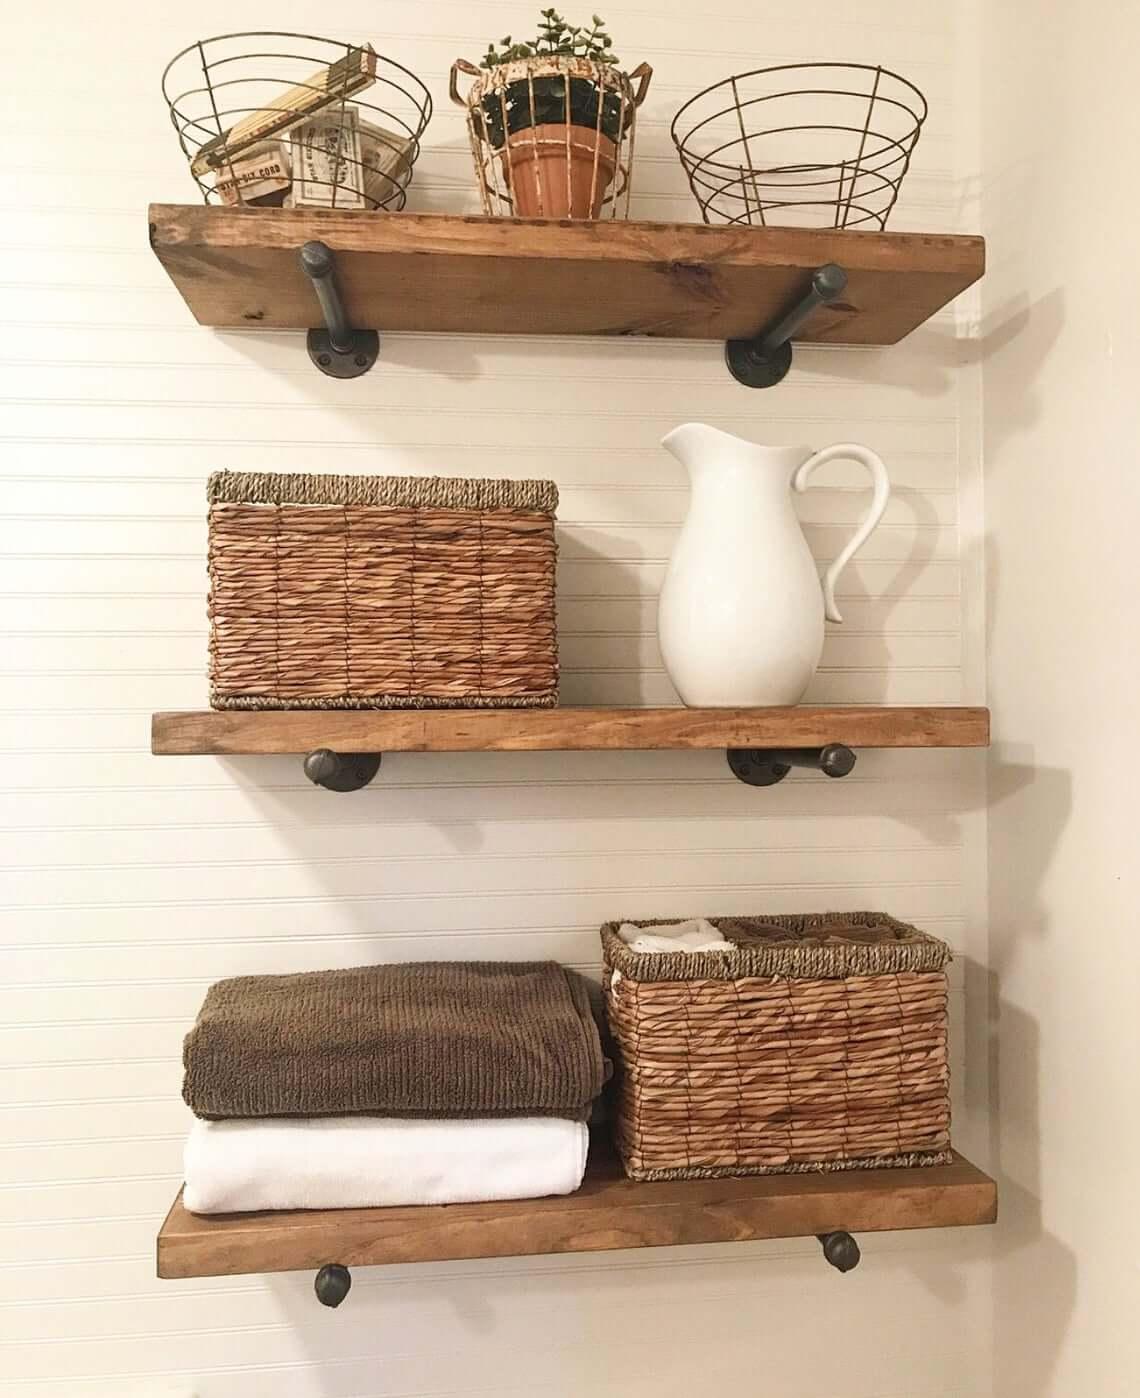 Wooden Floating Bathroom Storage Shelf